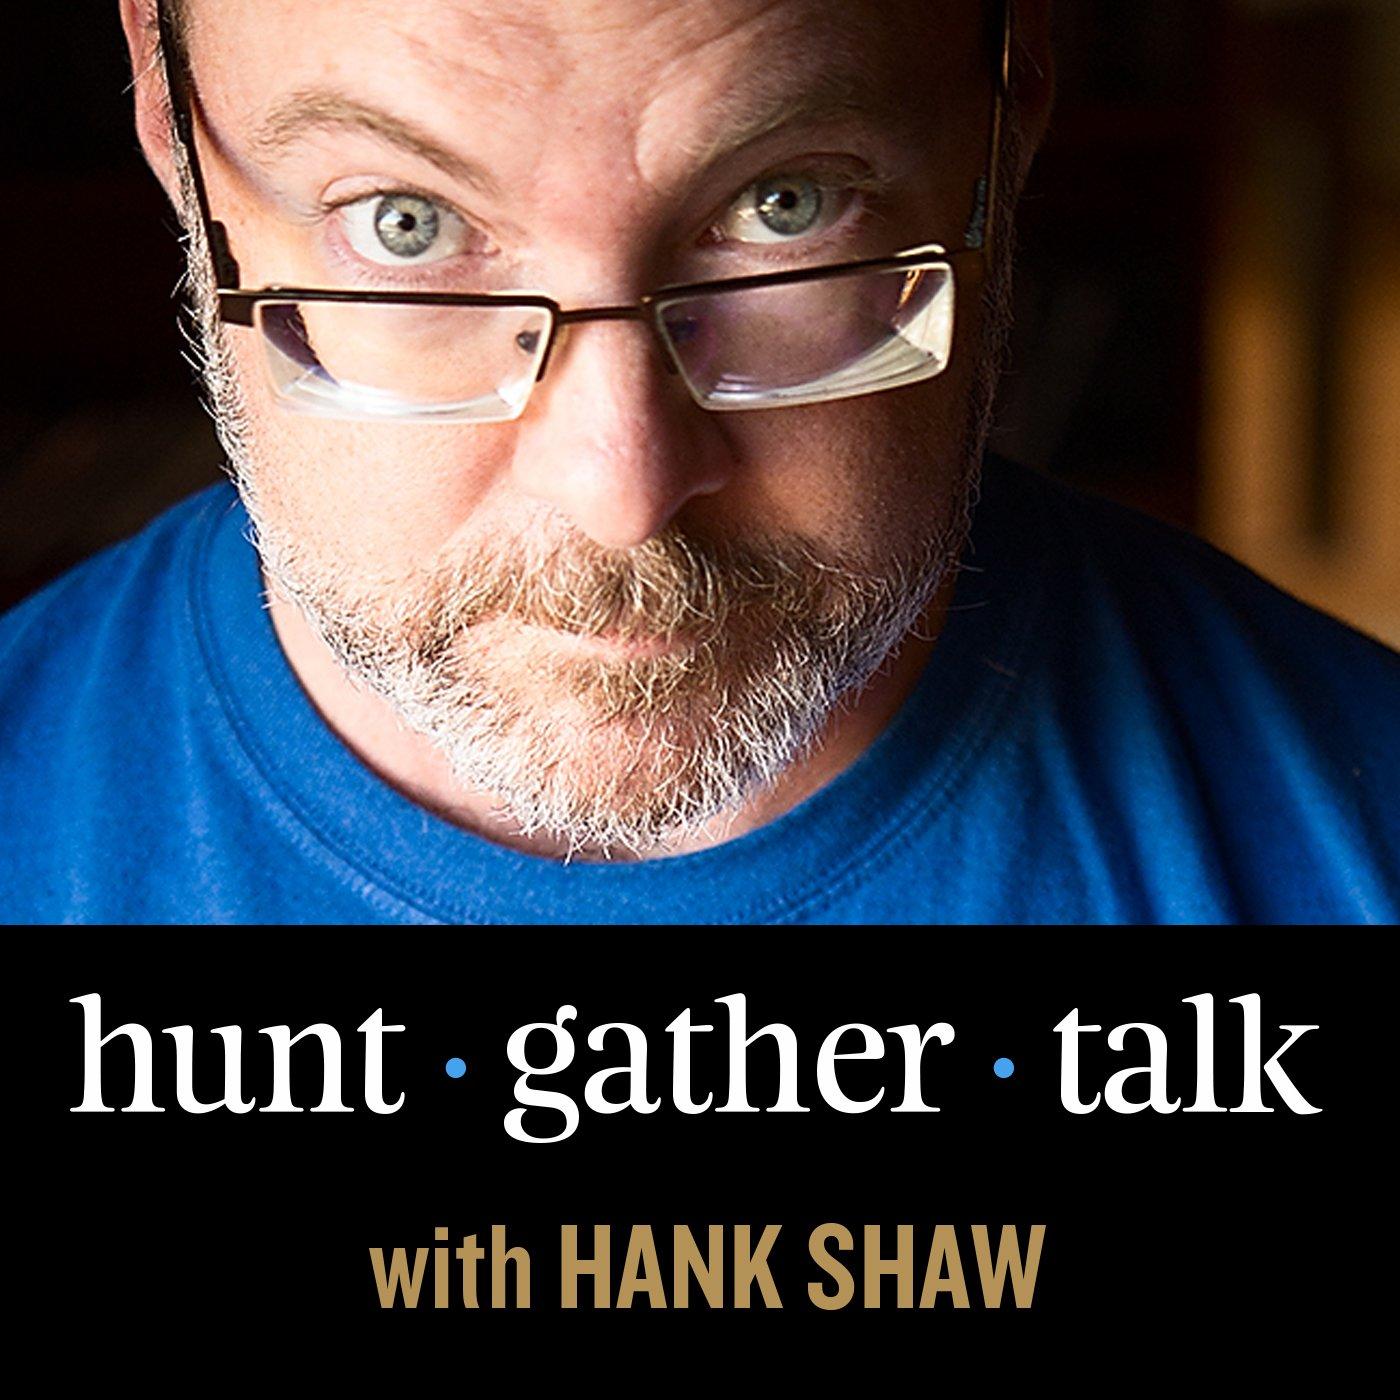 Hunt Gather Talk with Hank Shaw